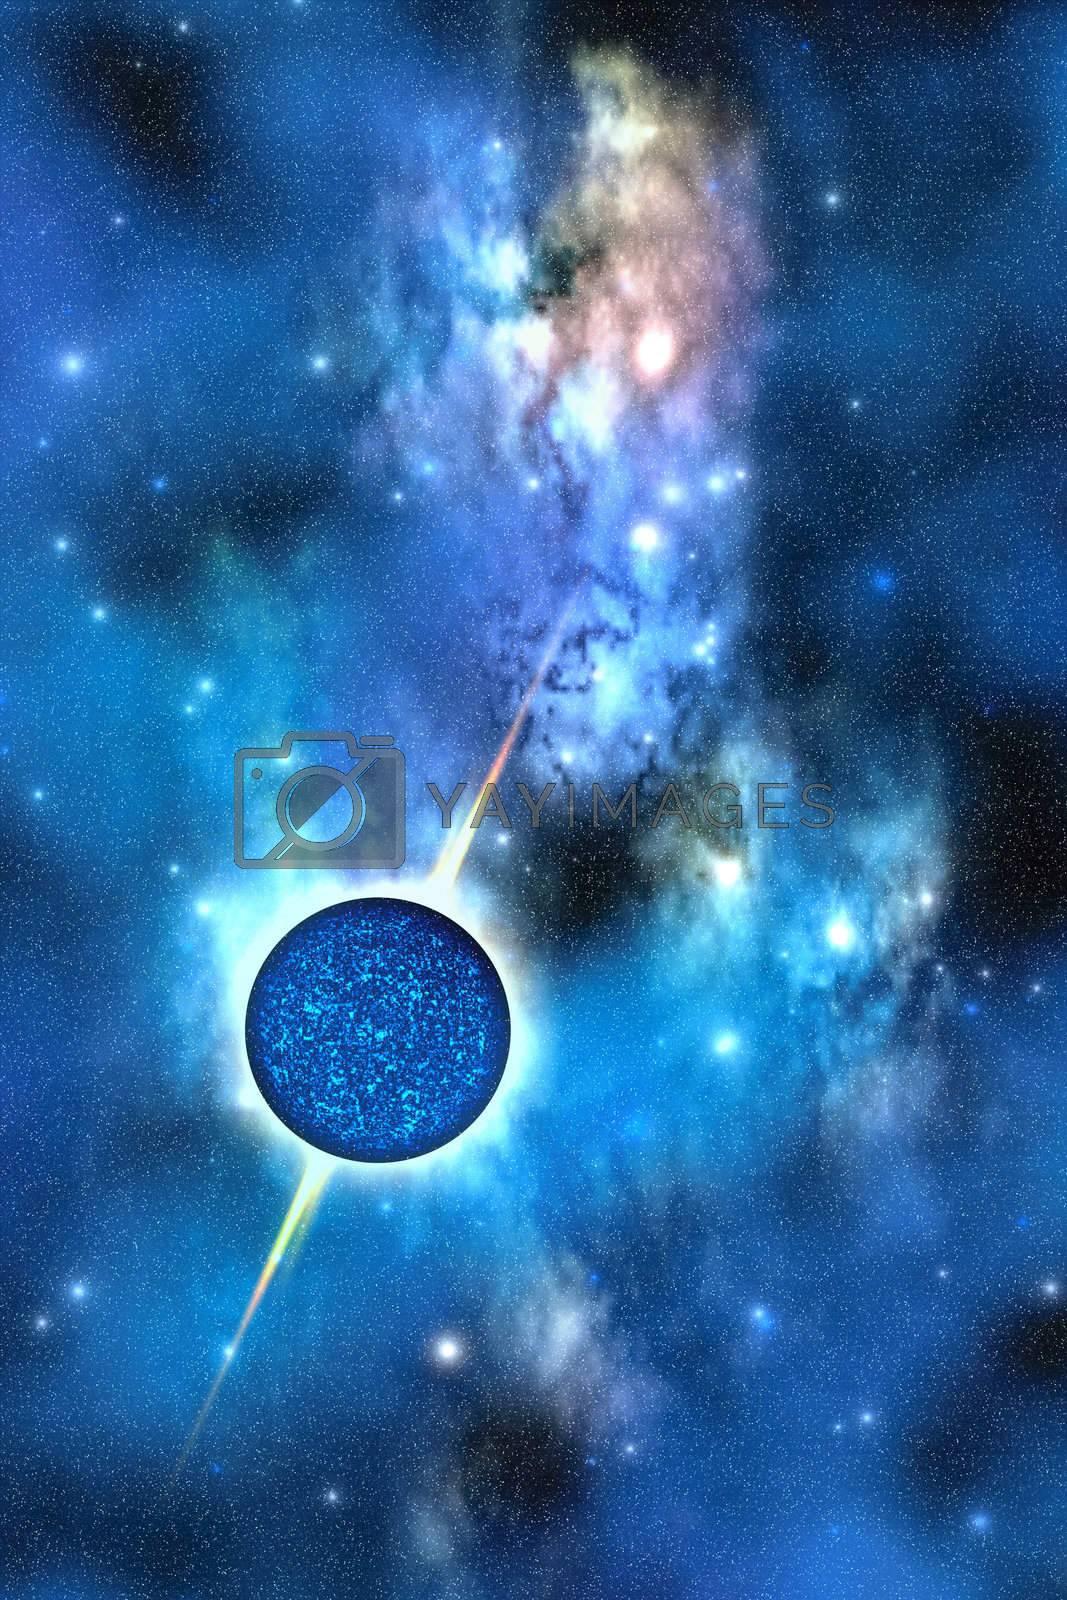 Royalty free image of NEUTRON STAR by Catmando